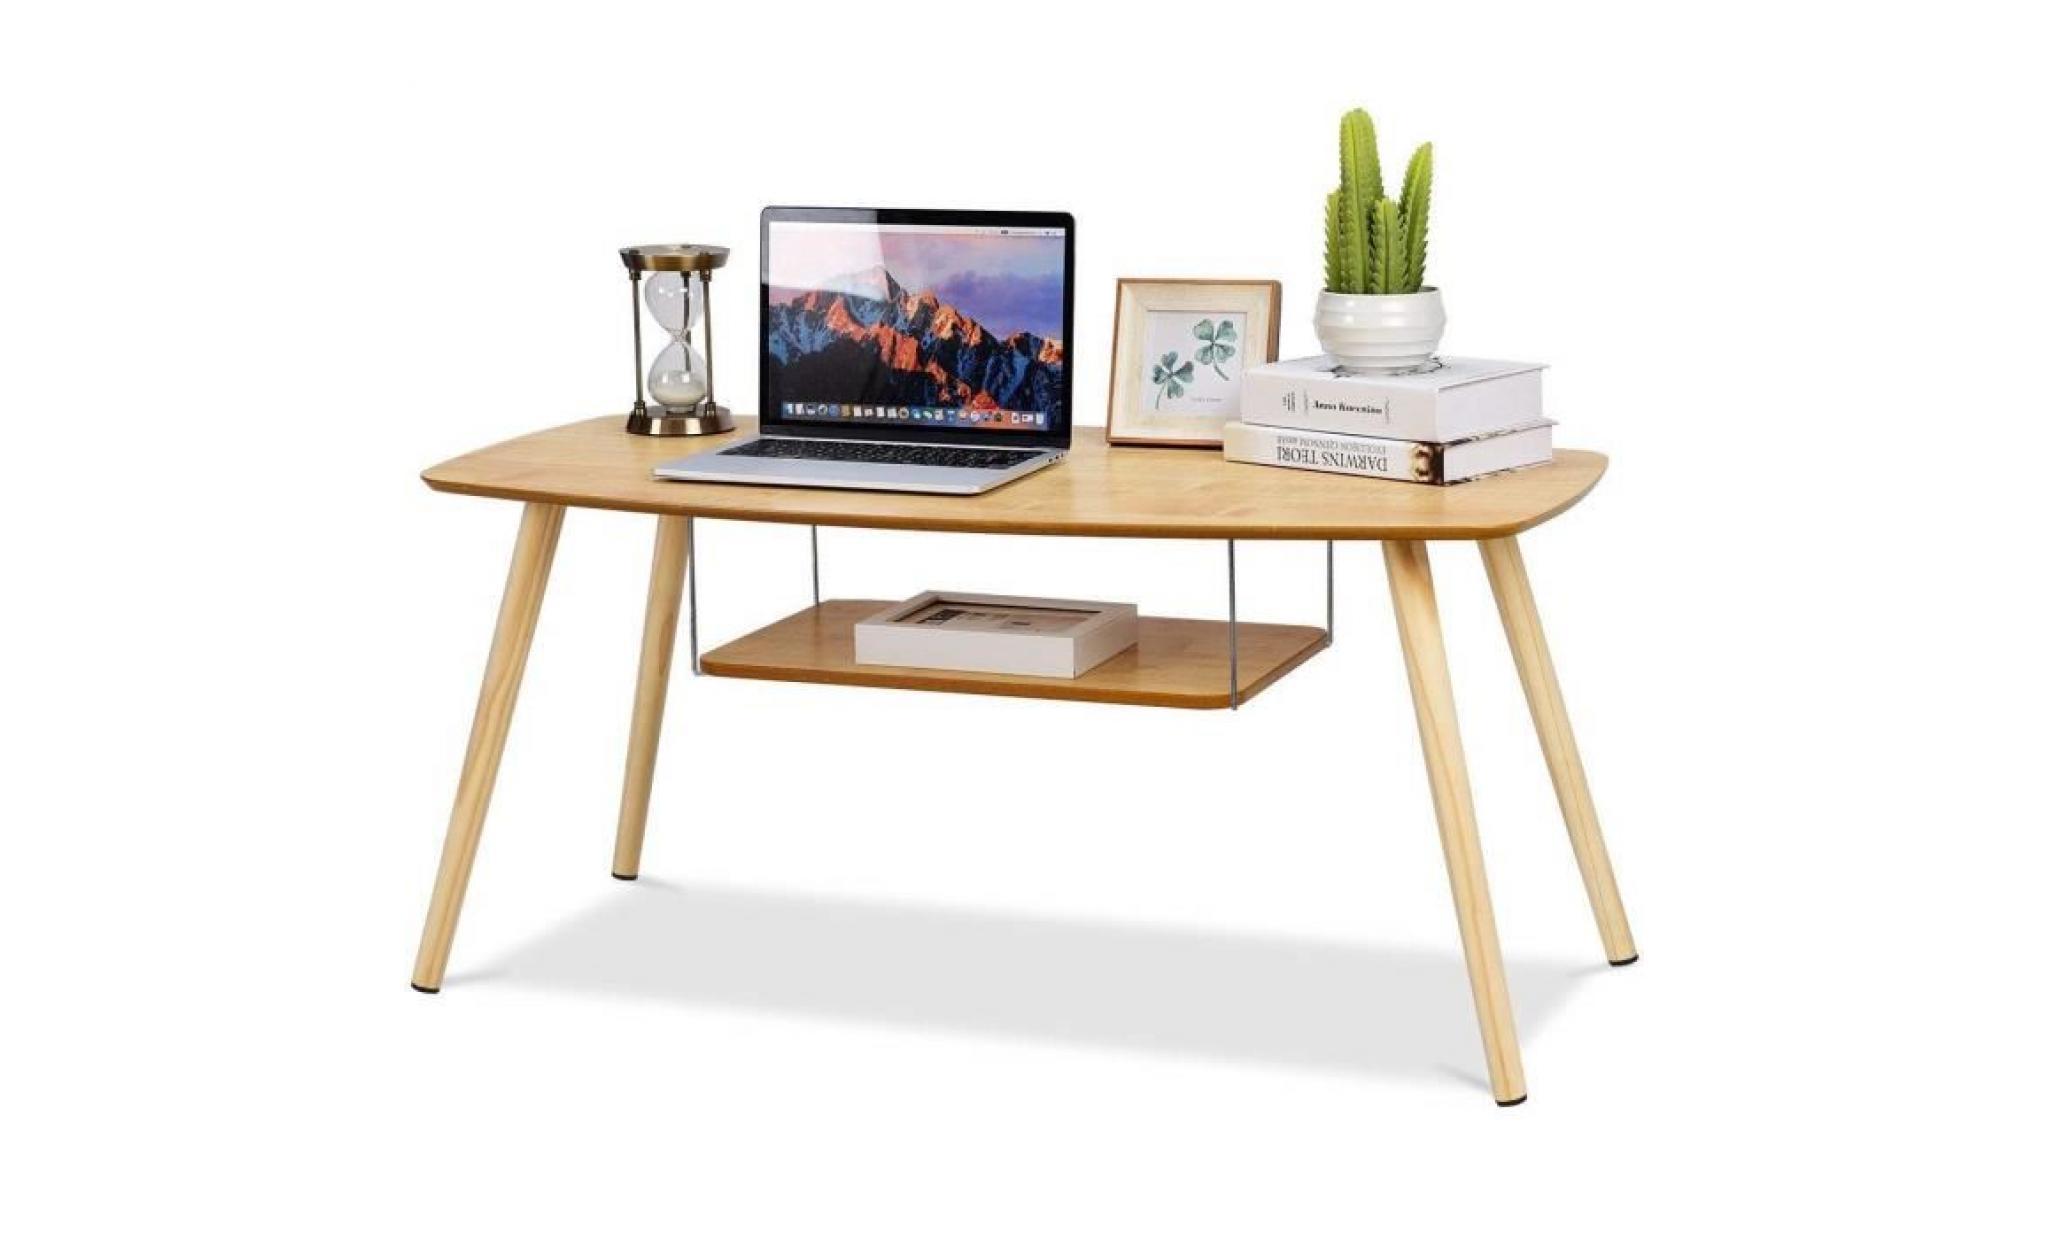 costway table basse en bois table d\'appoint 15mm mdf table basse de ...